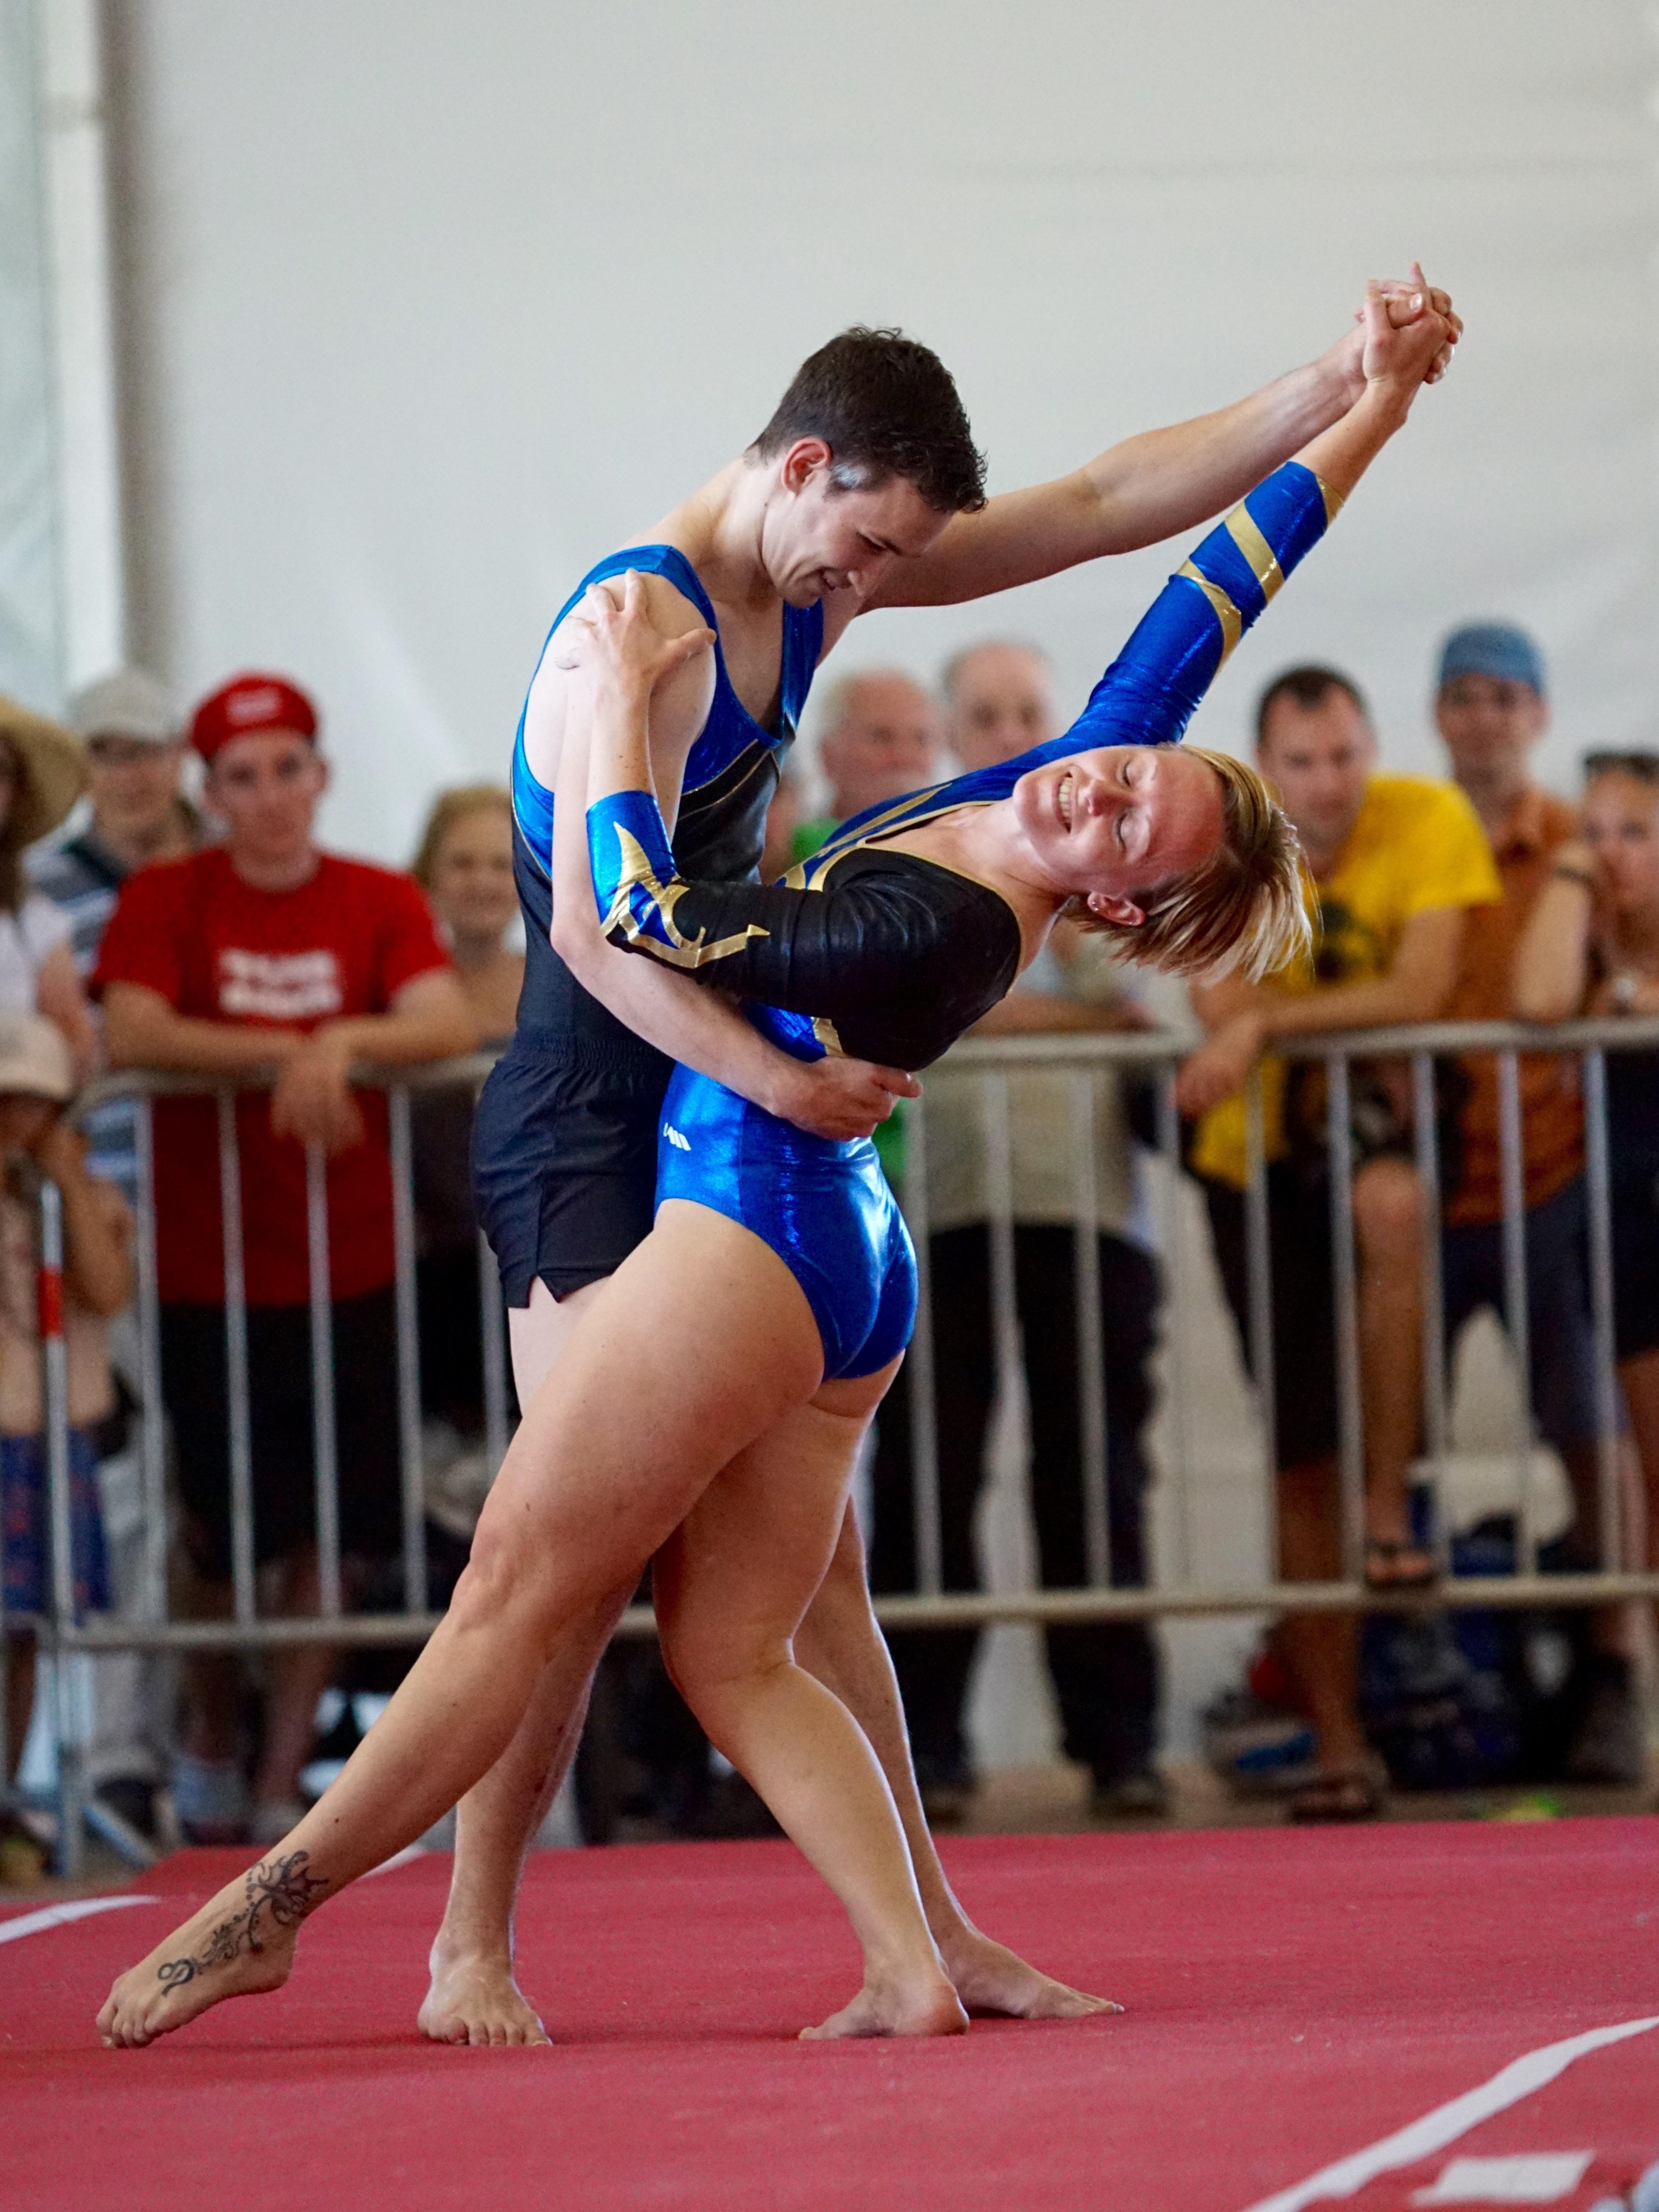 Fotos gratis competencia atletismo sprint gimnasia for Ejercicios de gimnasia